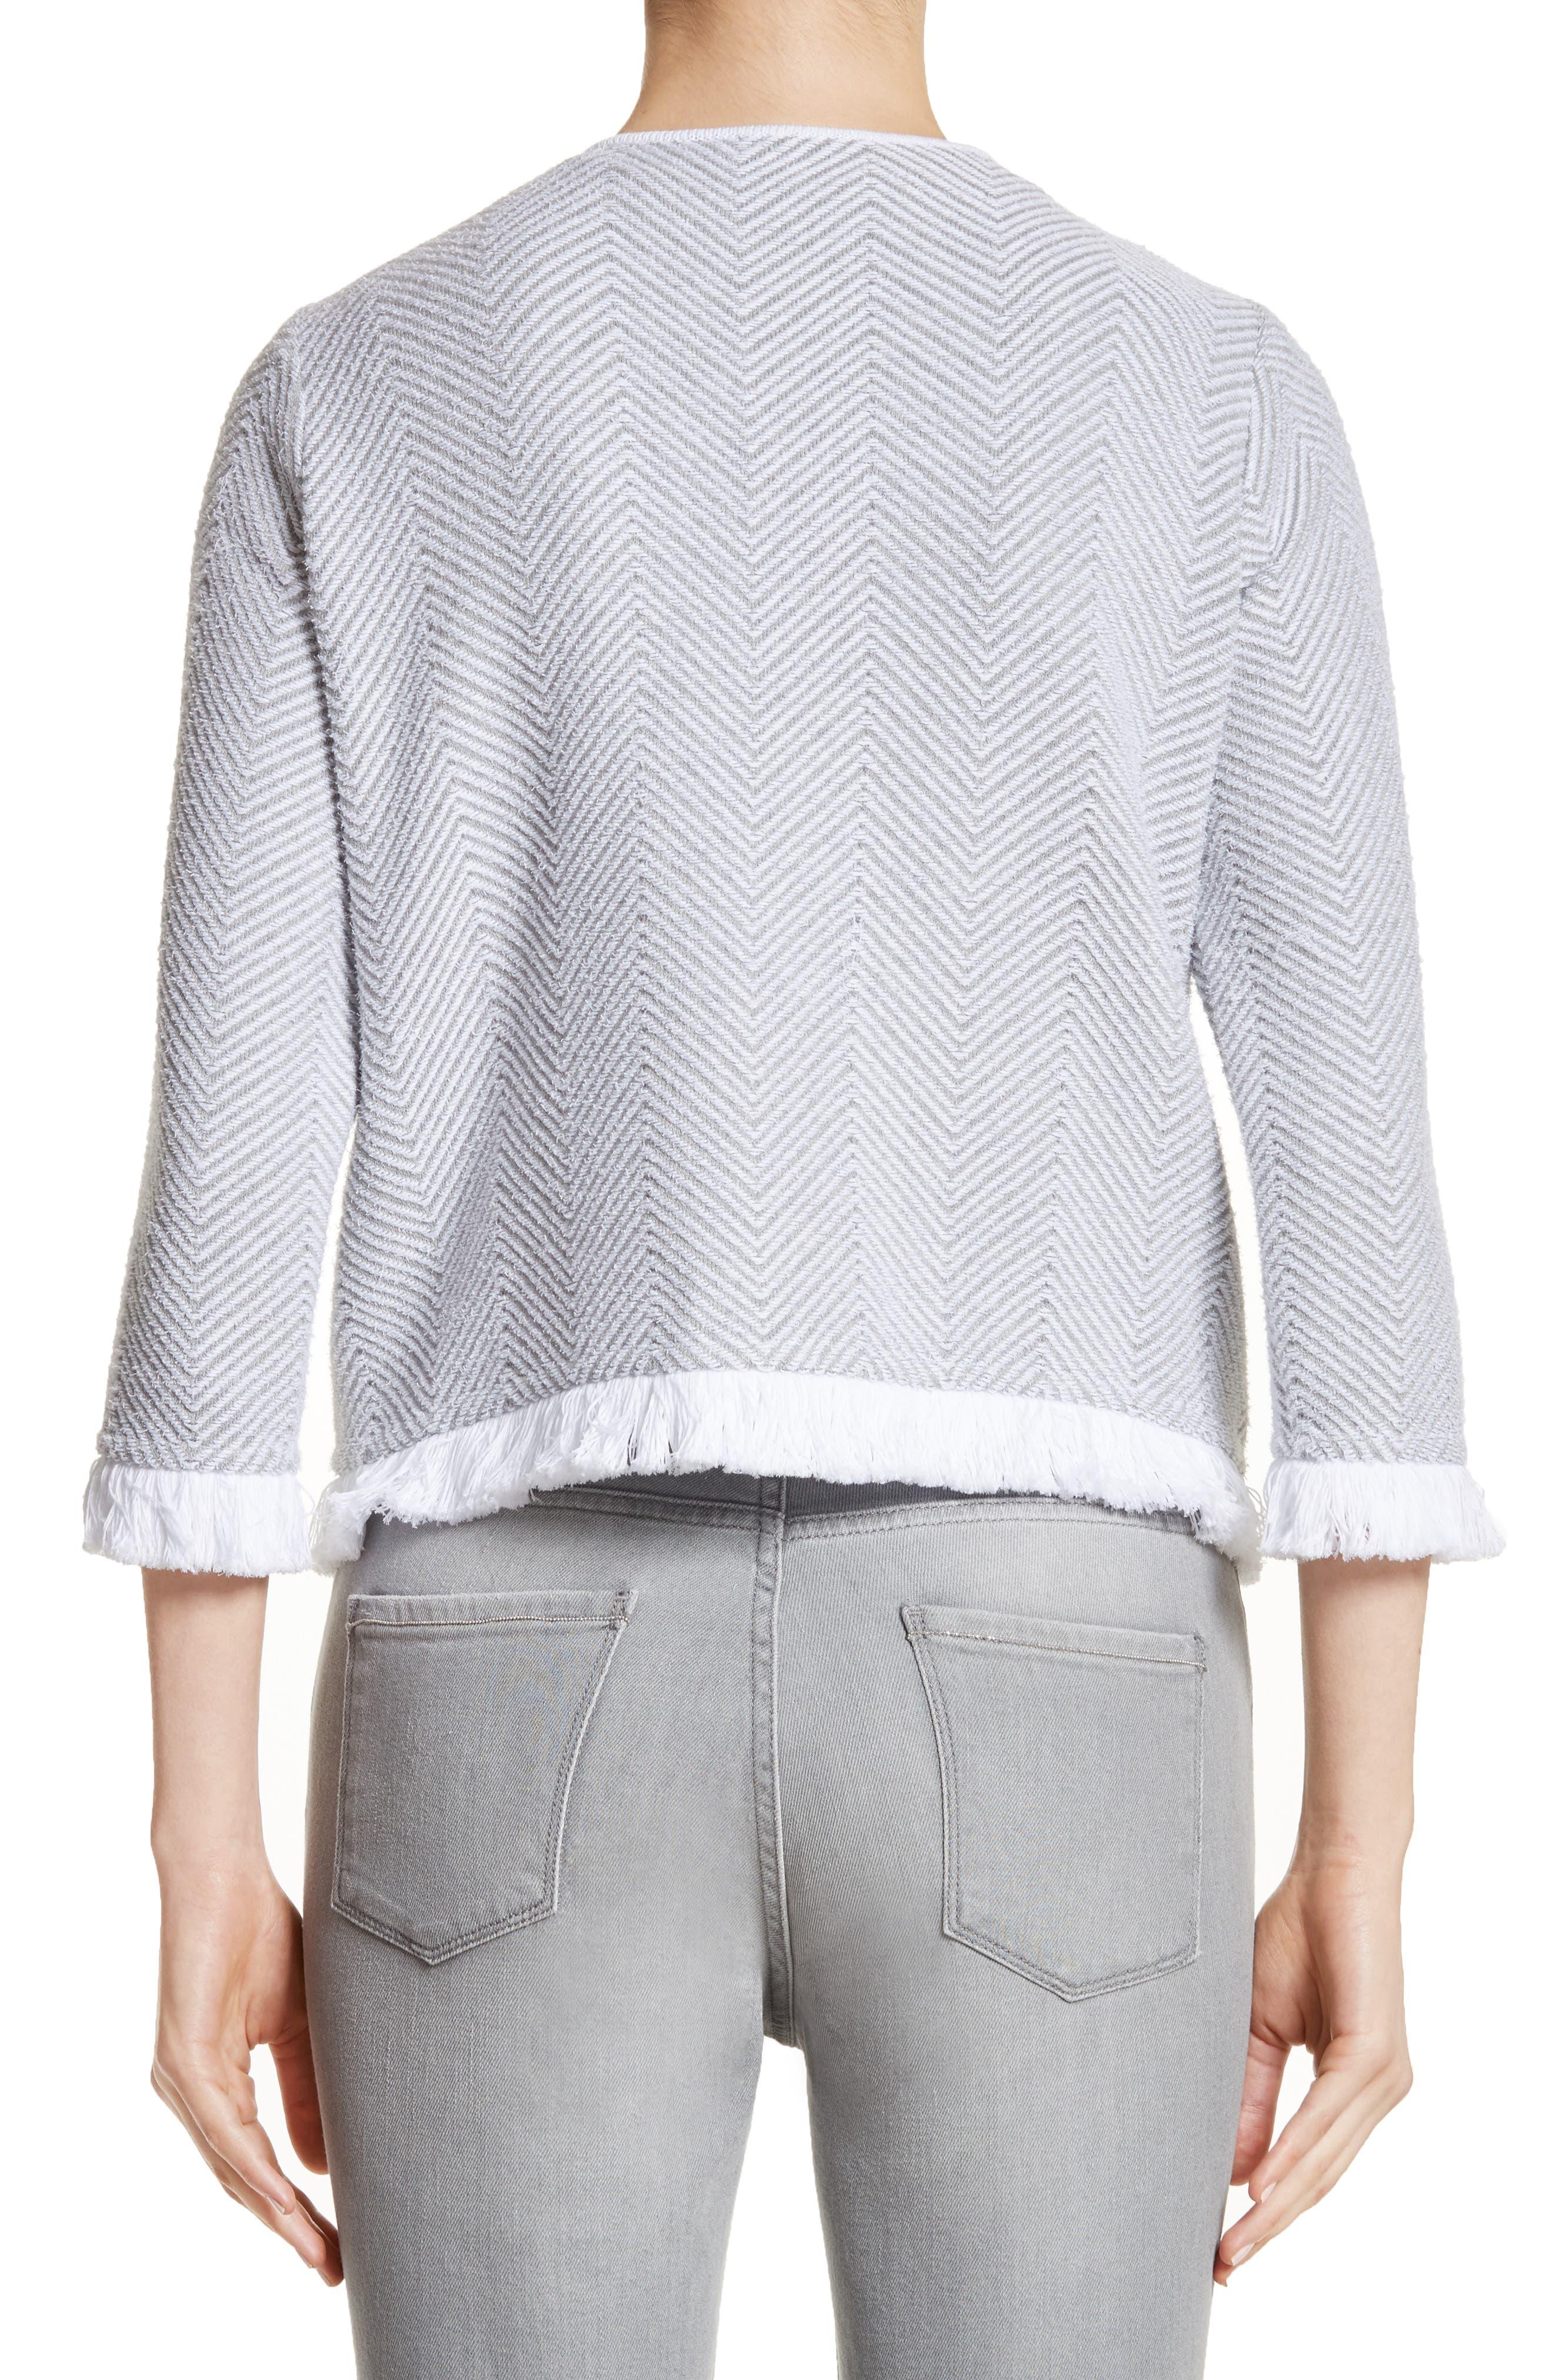 Chevron Knit Jacket,                             Alternate thumbnail 2, color,                             050